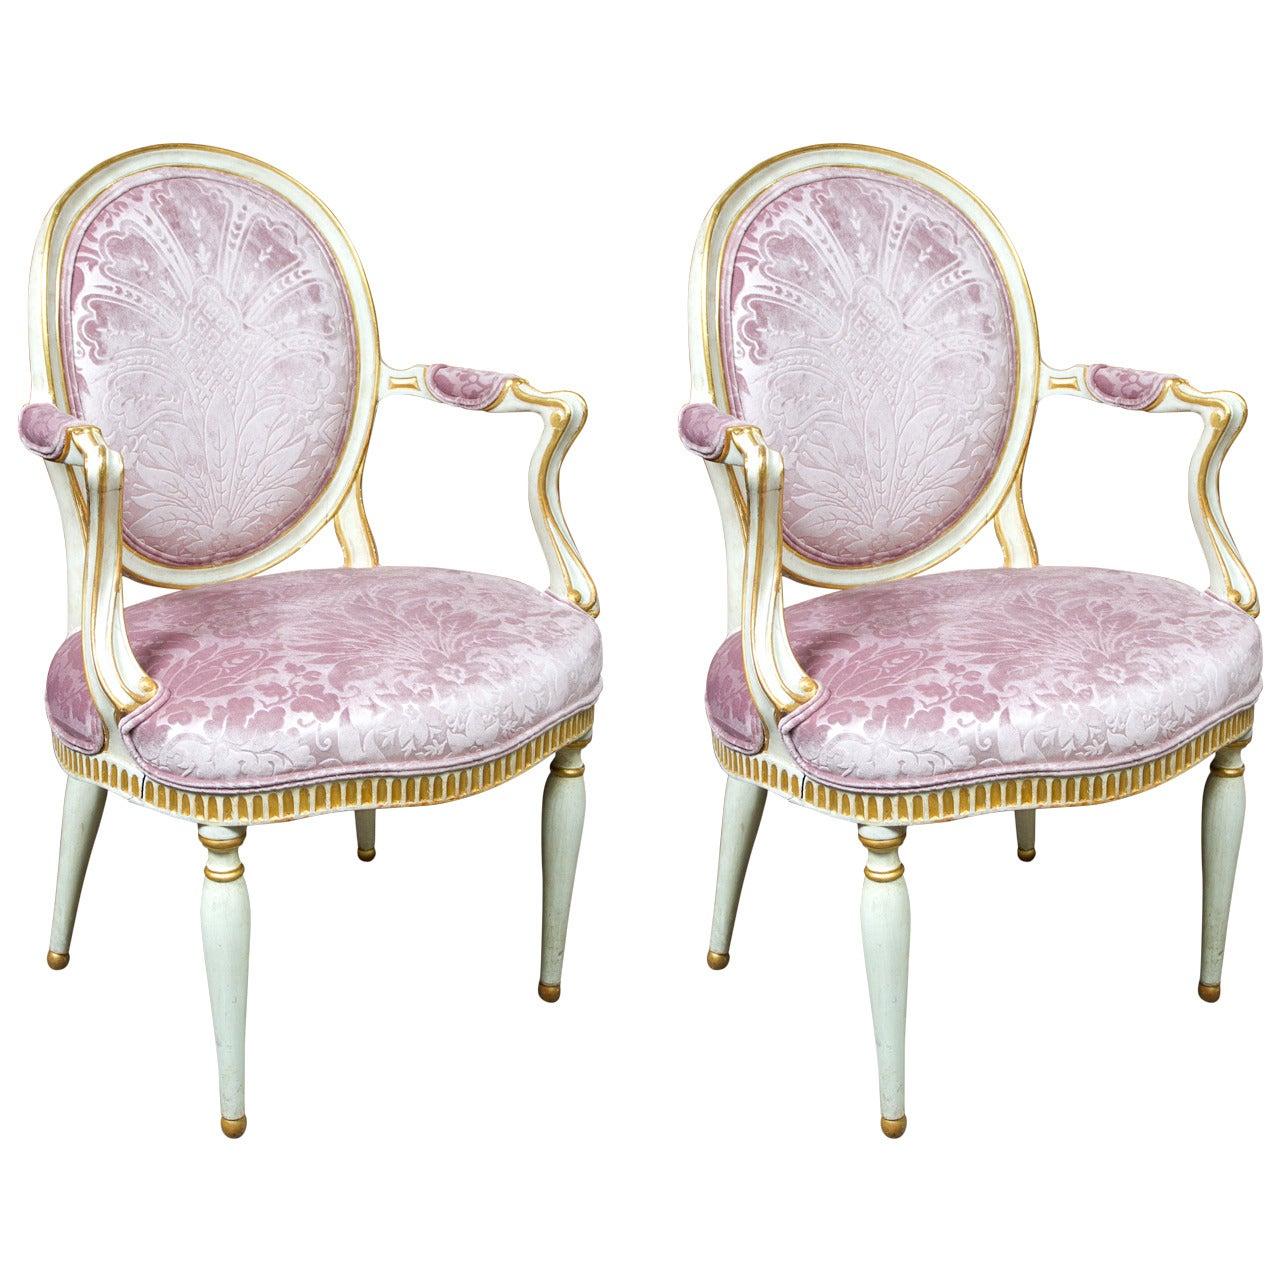 Pair of Italian Neoclassical Chairs